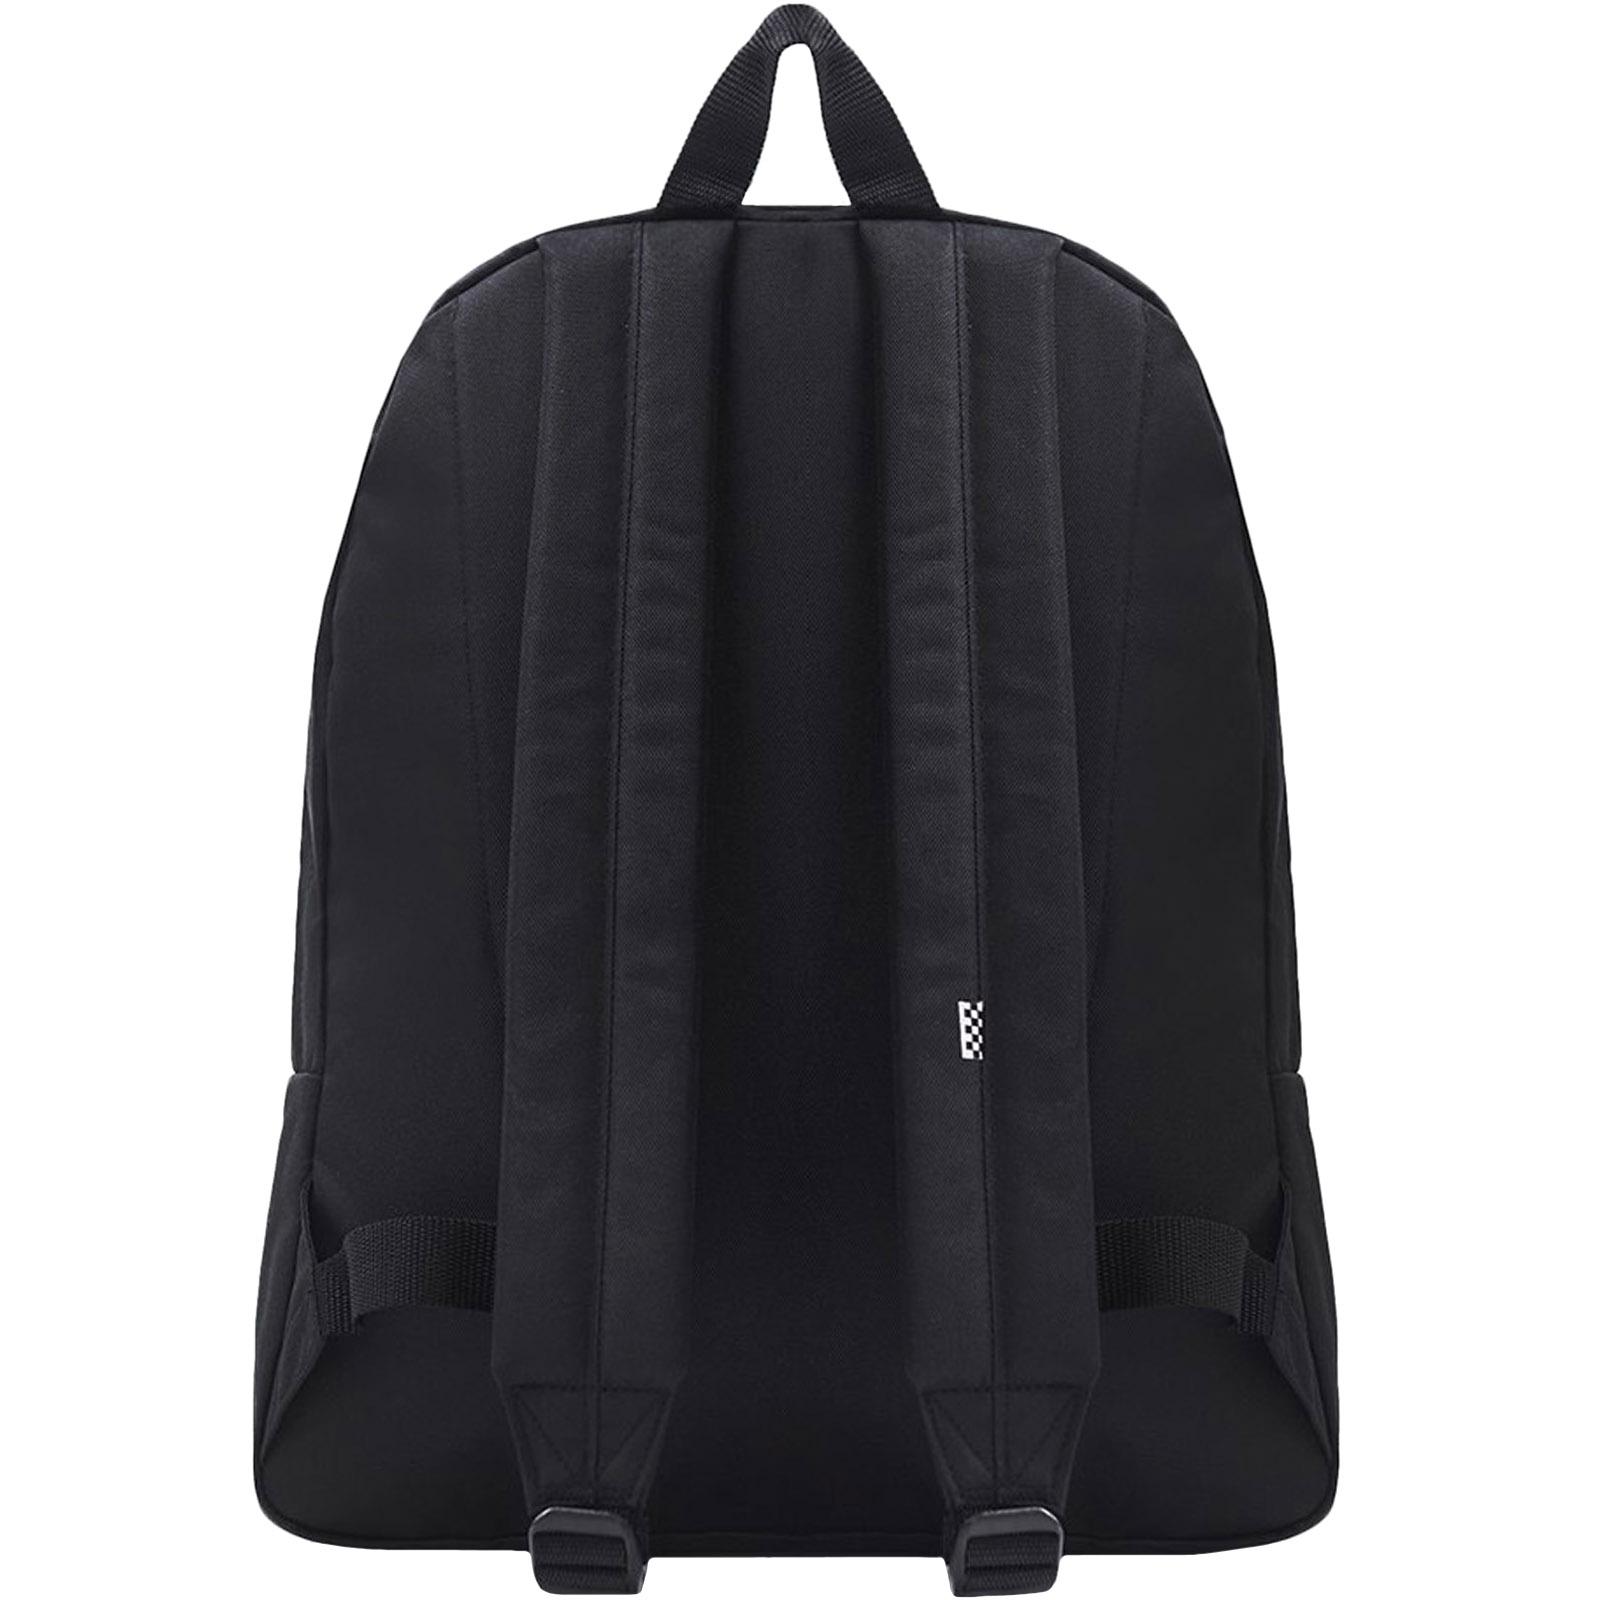 thumbnail 3 - Vans Unisex Two Strap Realm Adjustable School College Rucksack Backpack Bag